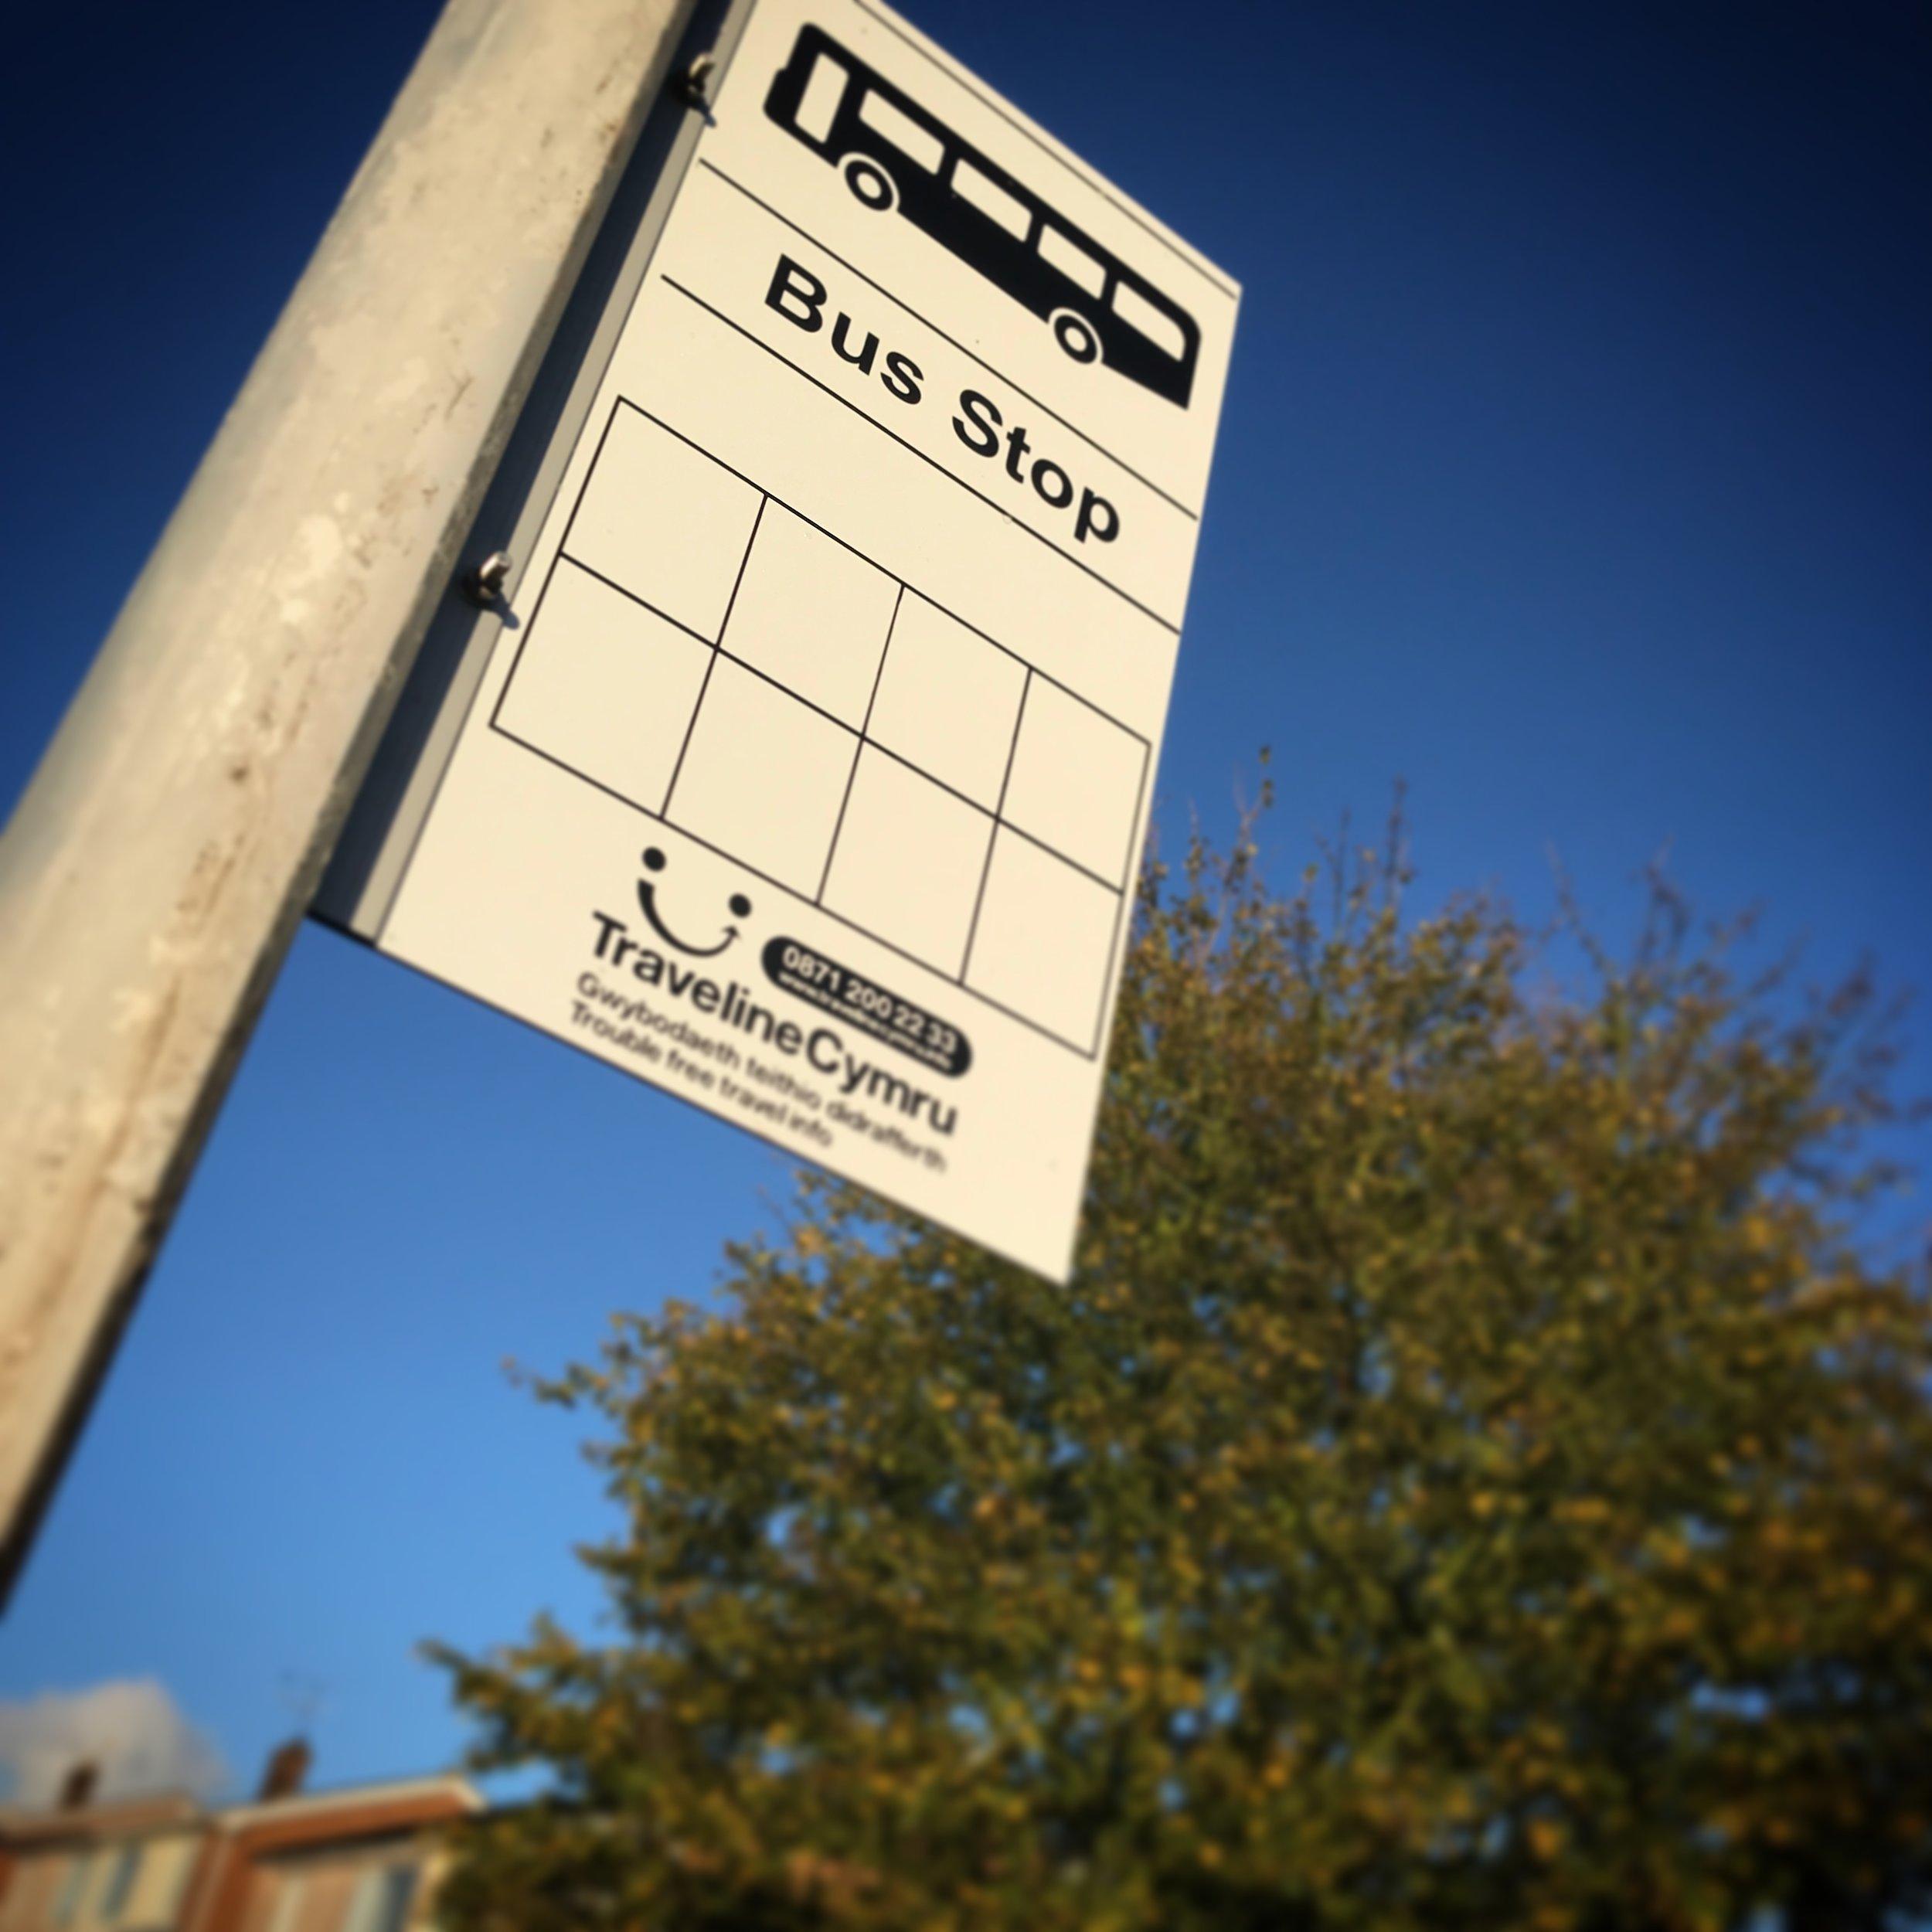 community transport2.jpg